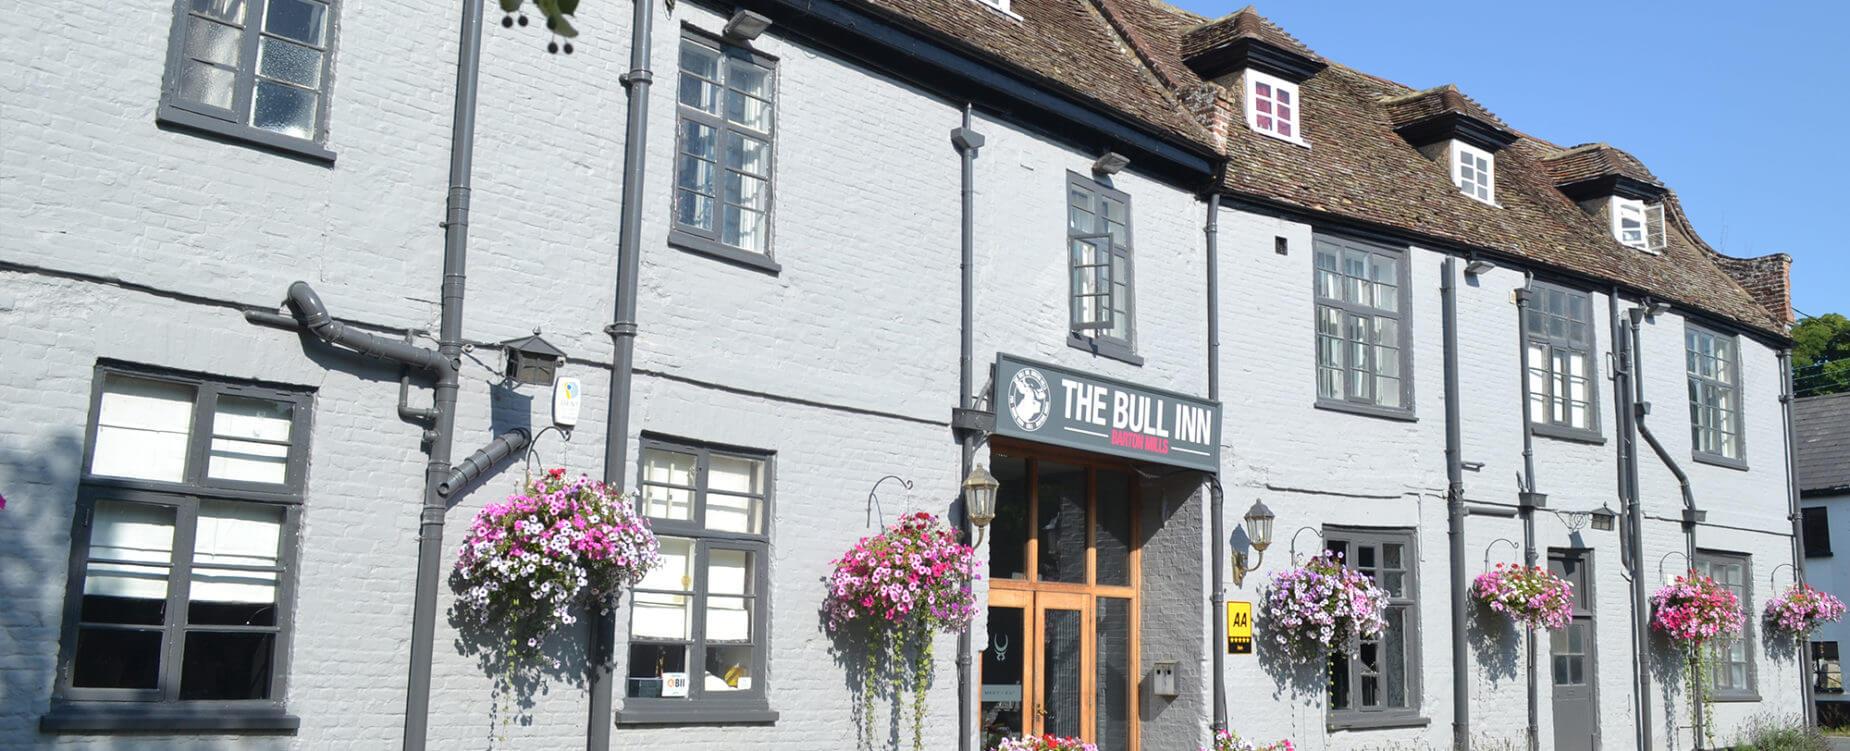 The Bull Inn, Barton Mills Suffolk | Boutique Hotel & Restaurant